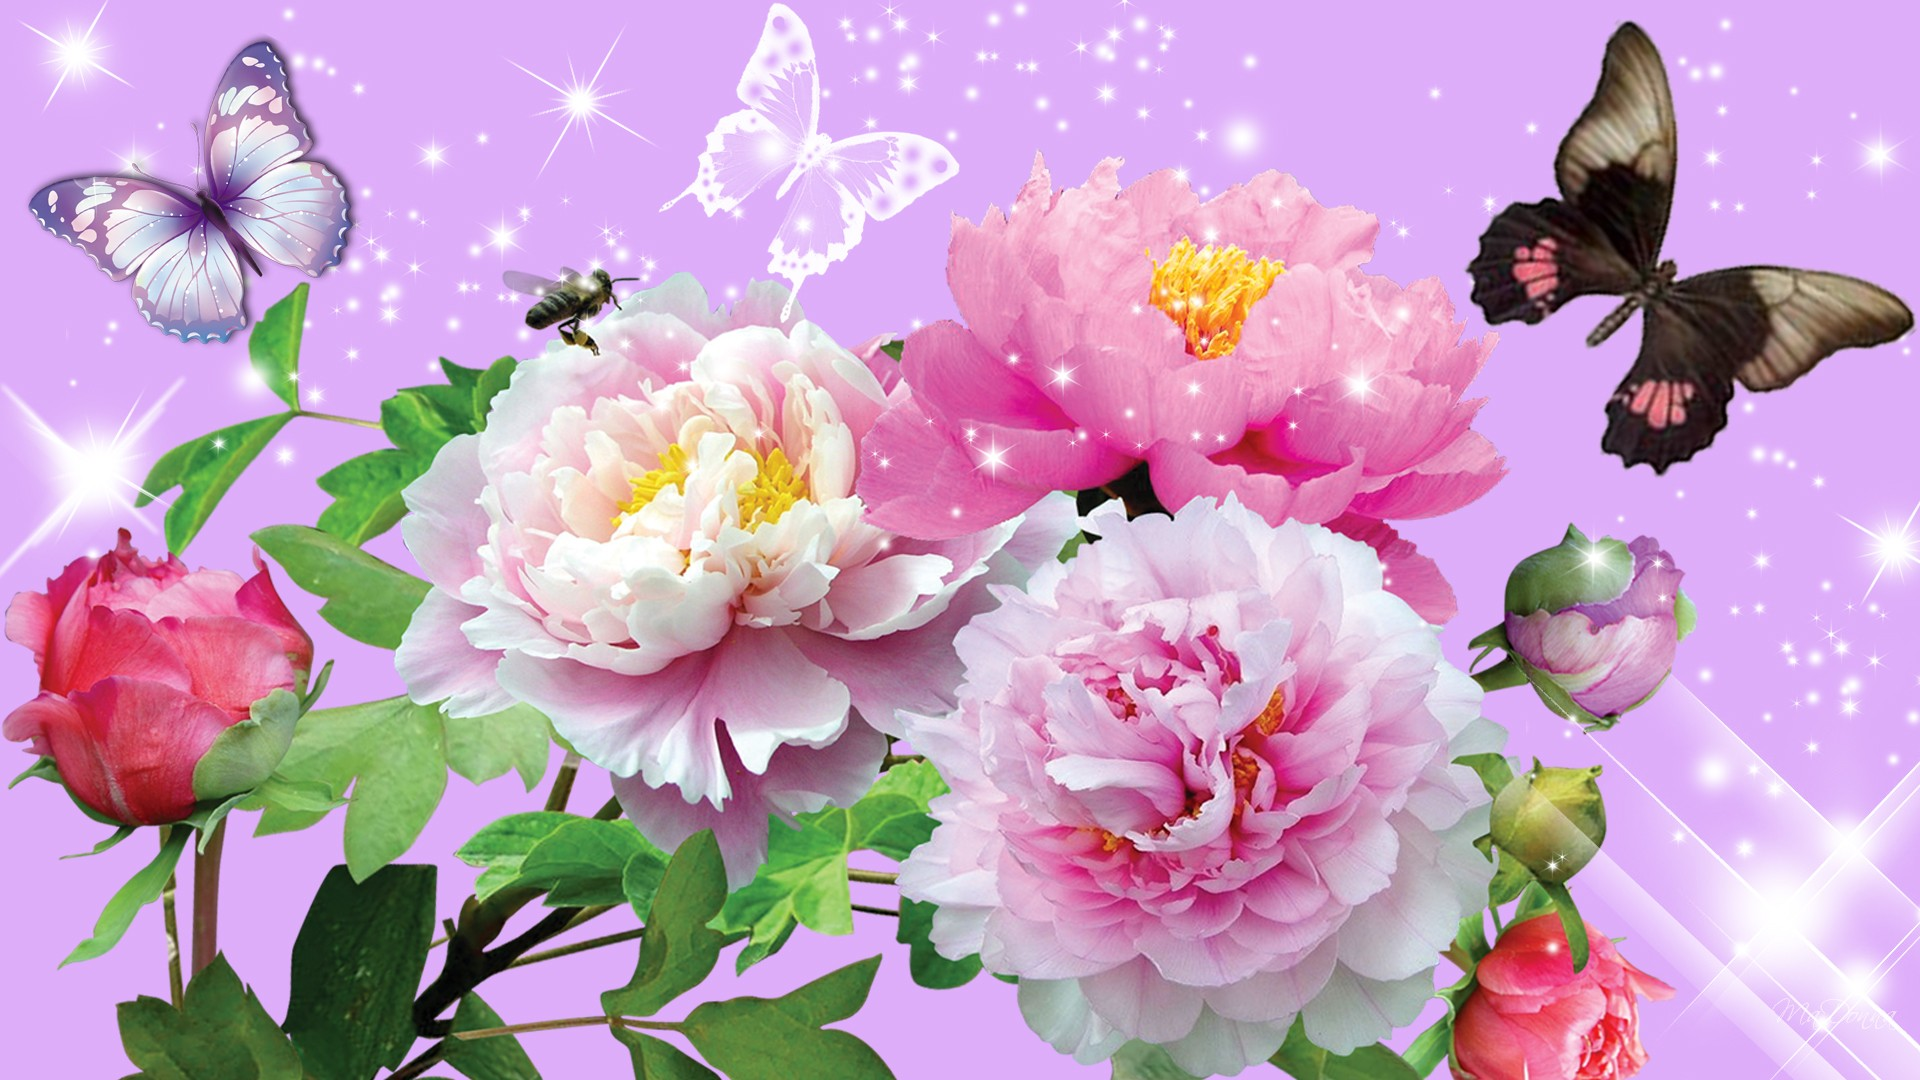 Free Wallpaper Butterflies And Flowers , HD Wallpaper & Backgrounds